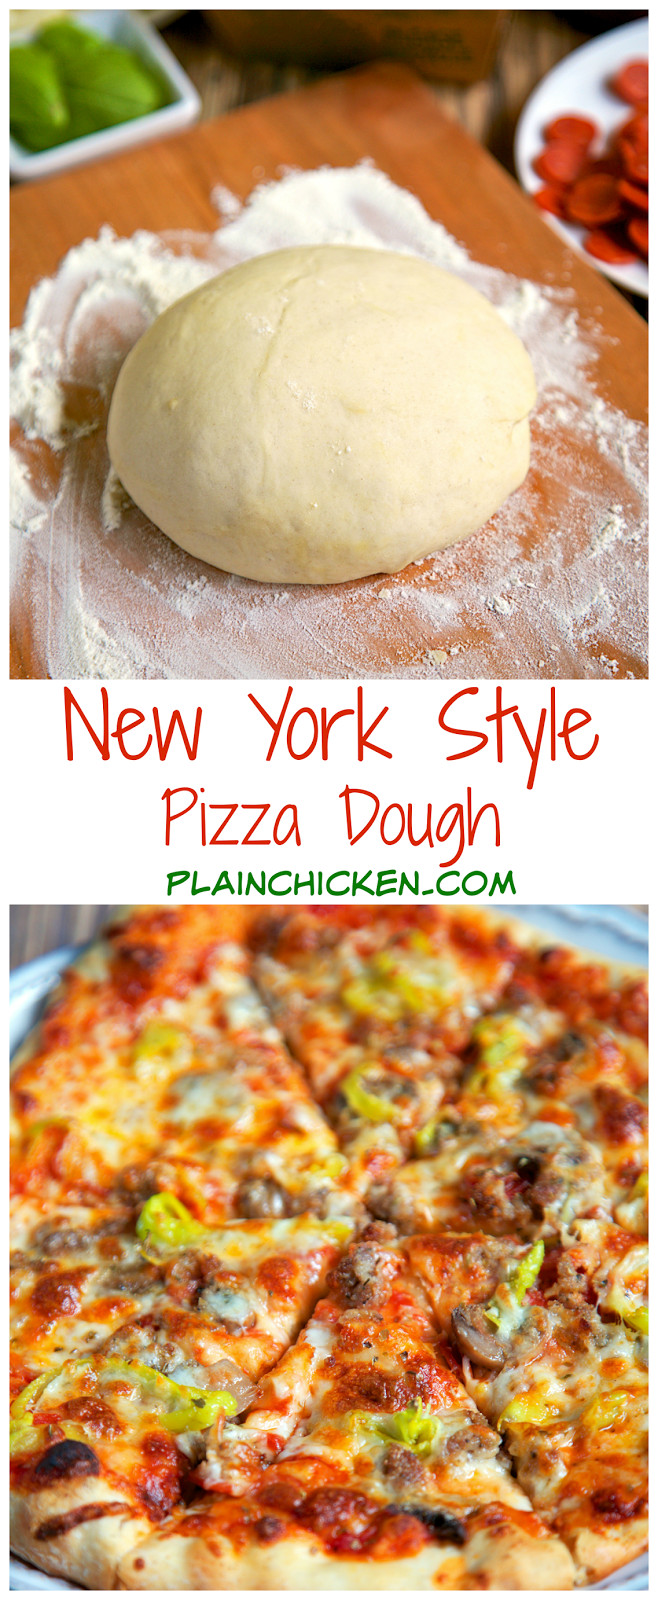 New York Style Pizza Dough Recipe  New York Style Pizza Dough